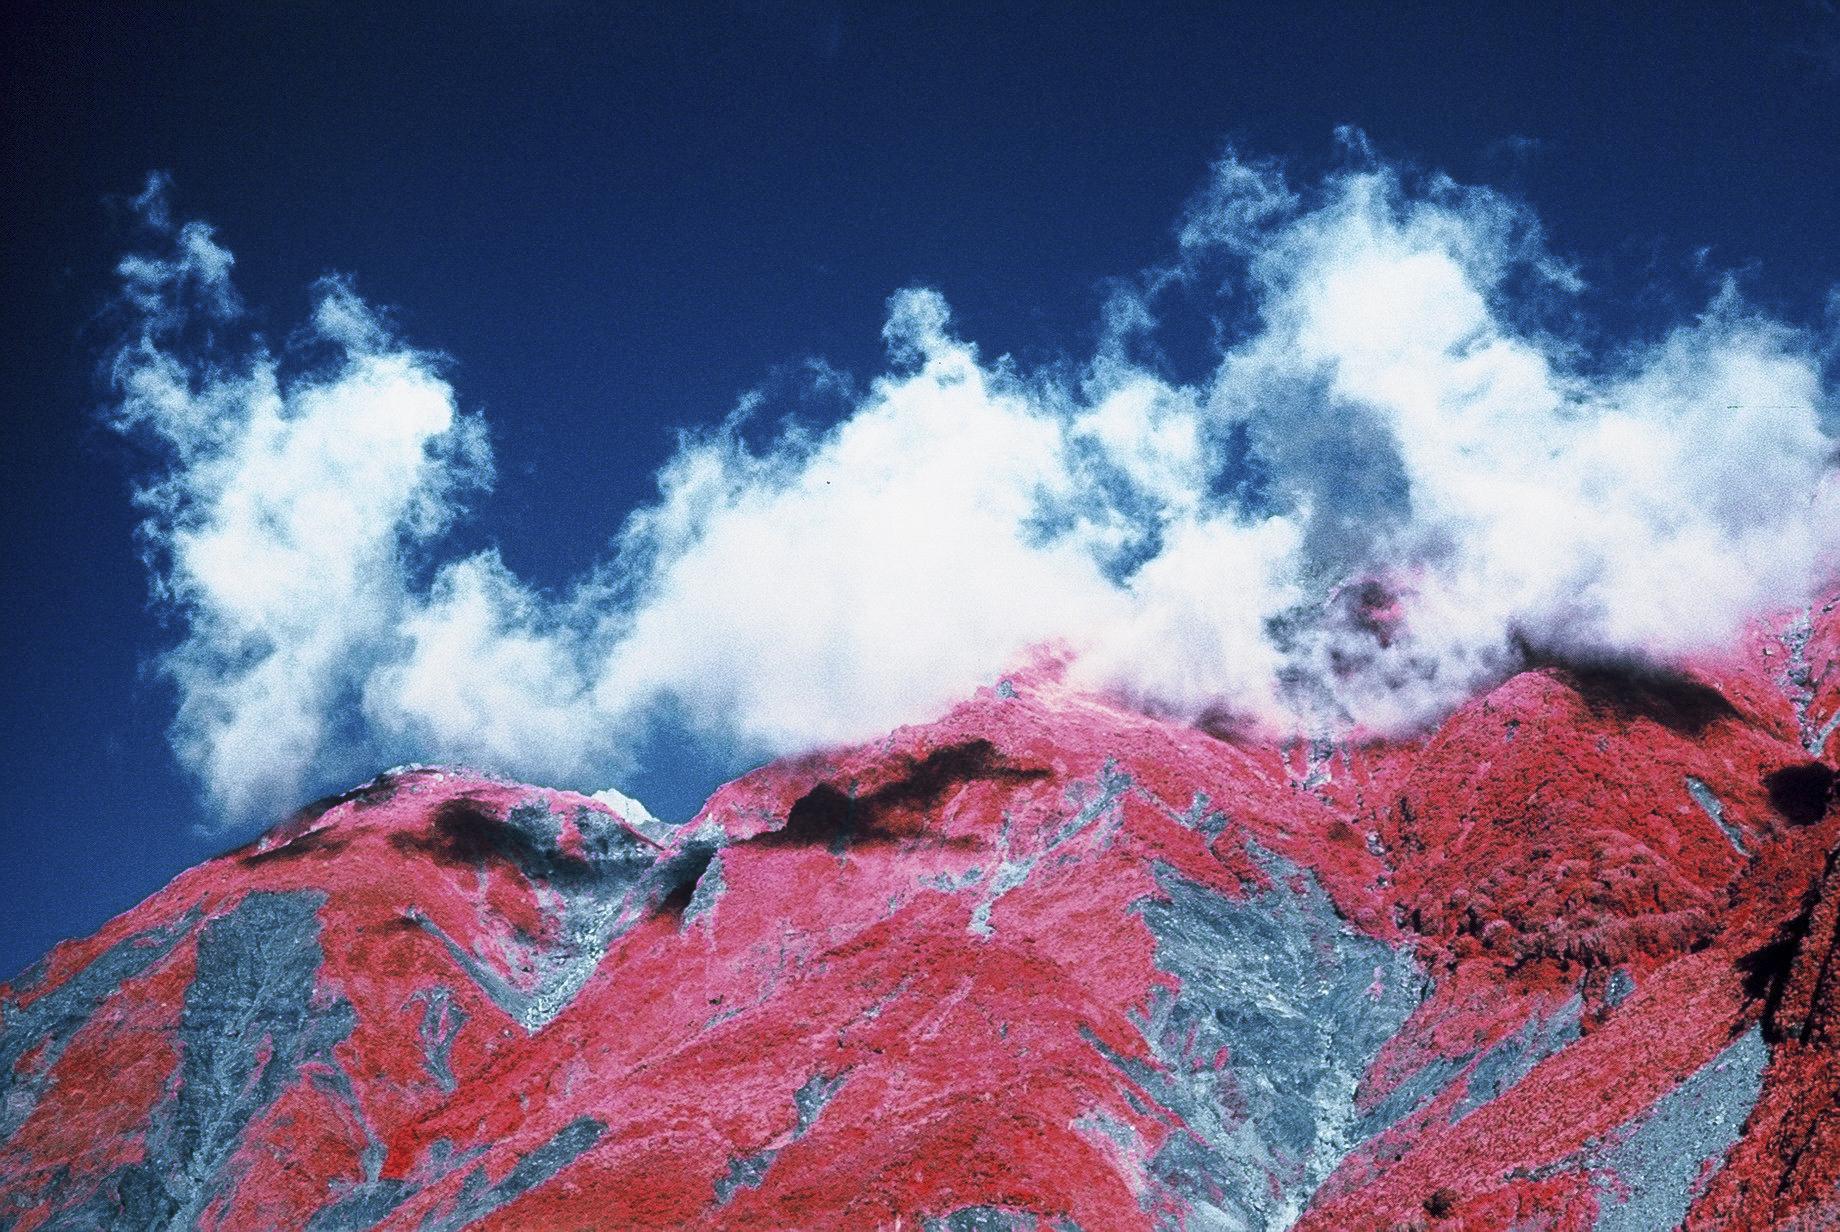 Infrared-New-Zealand-Kasia-Sykus-7.jpg